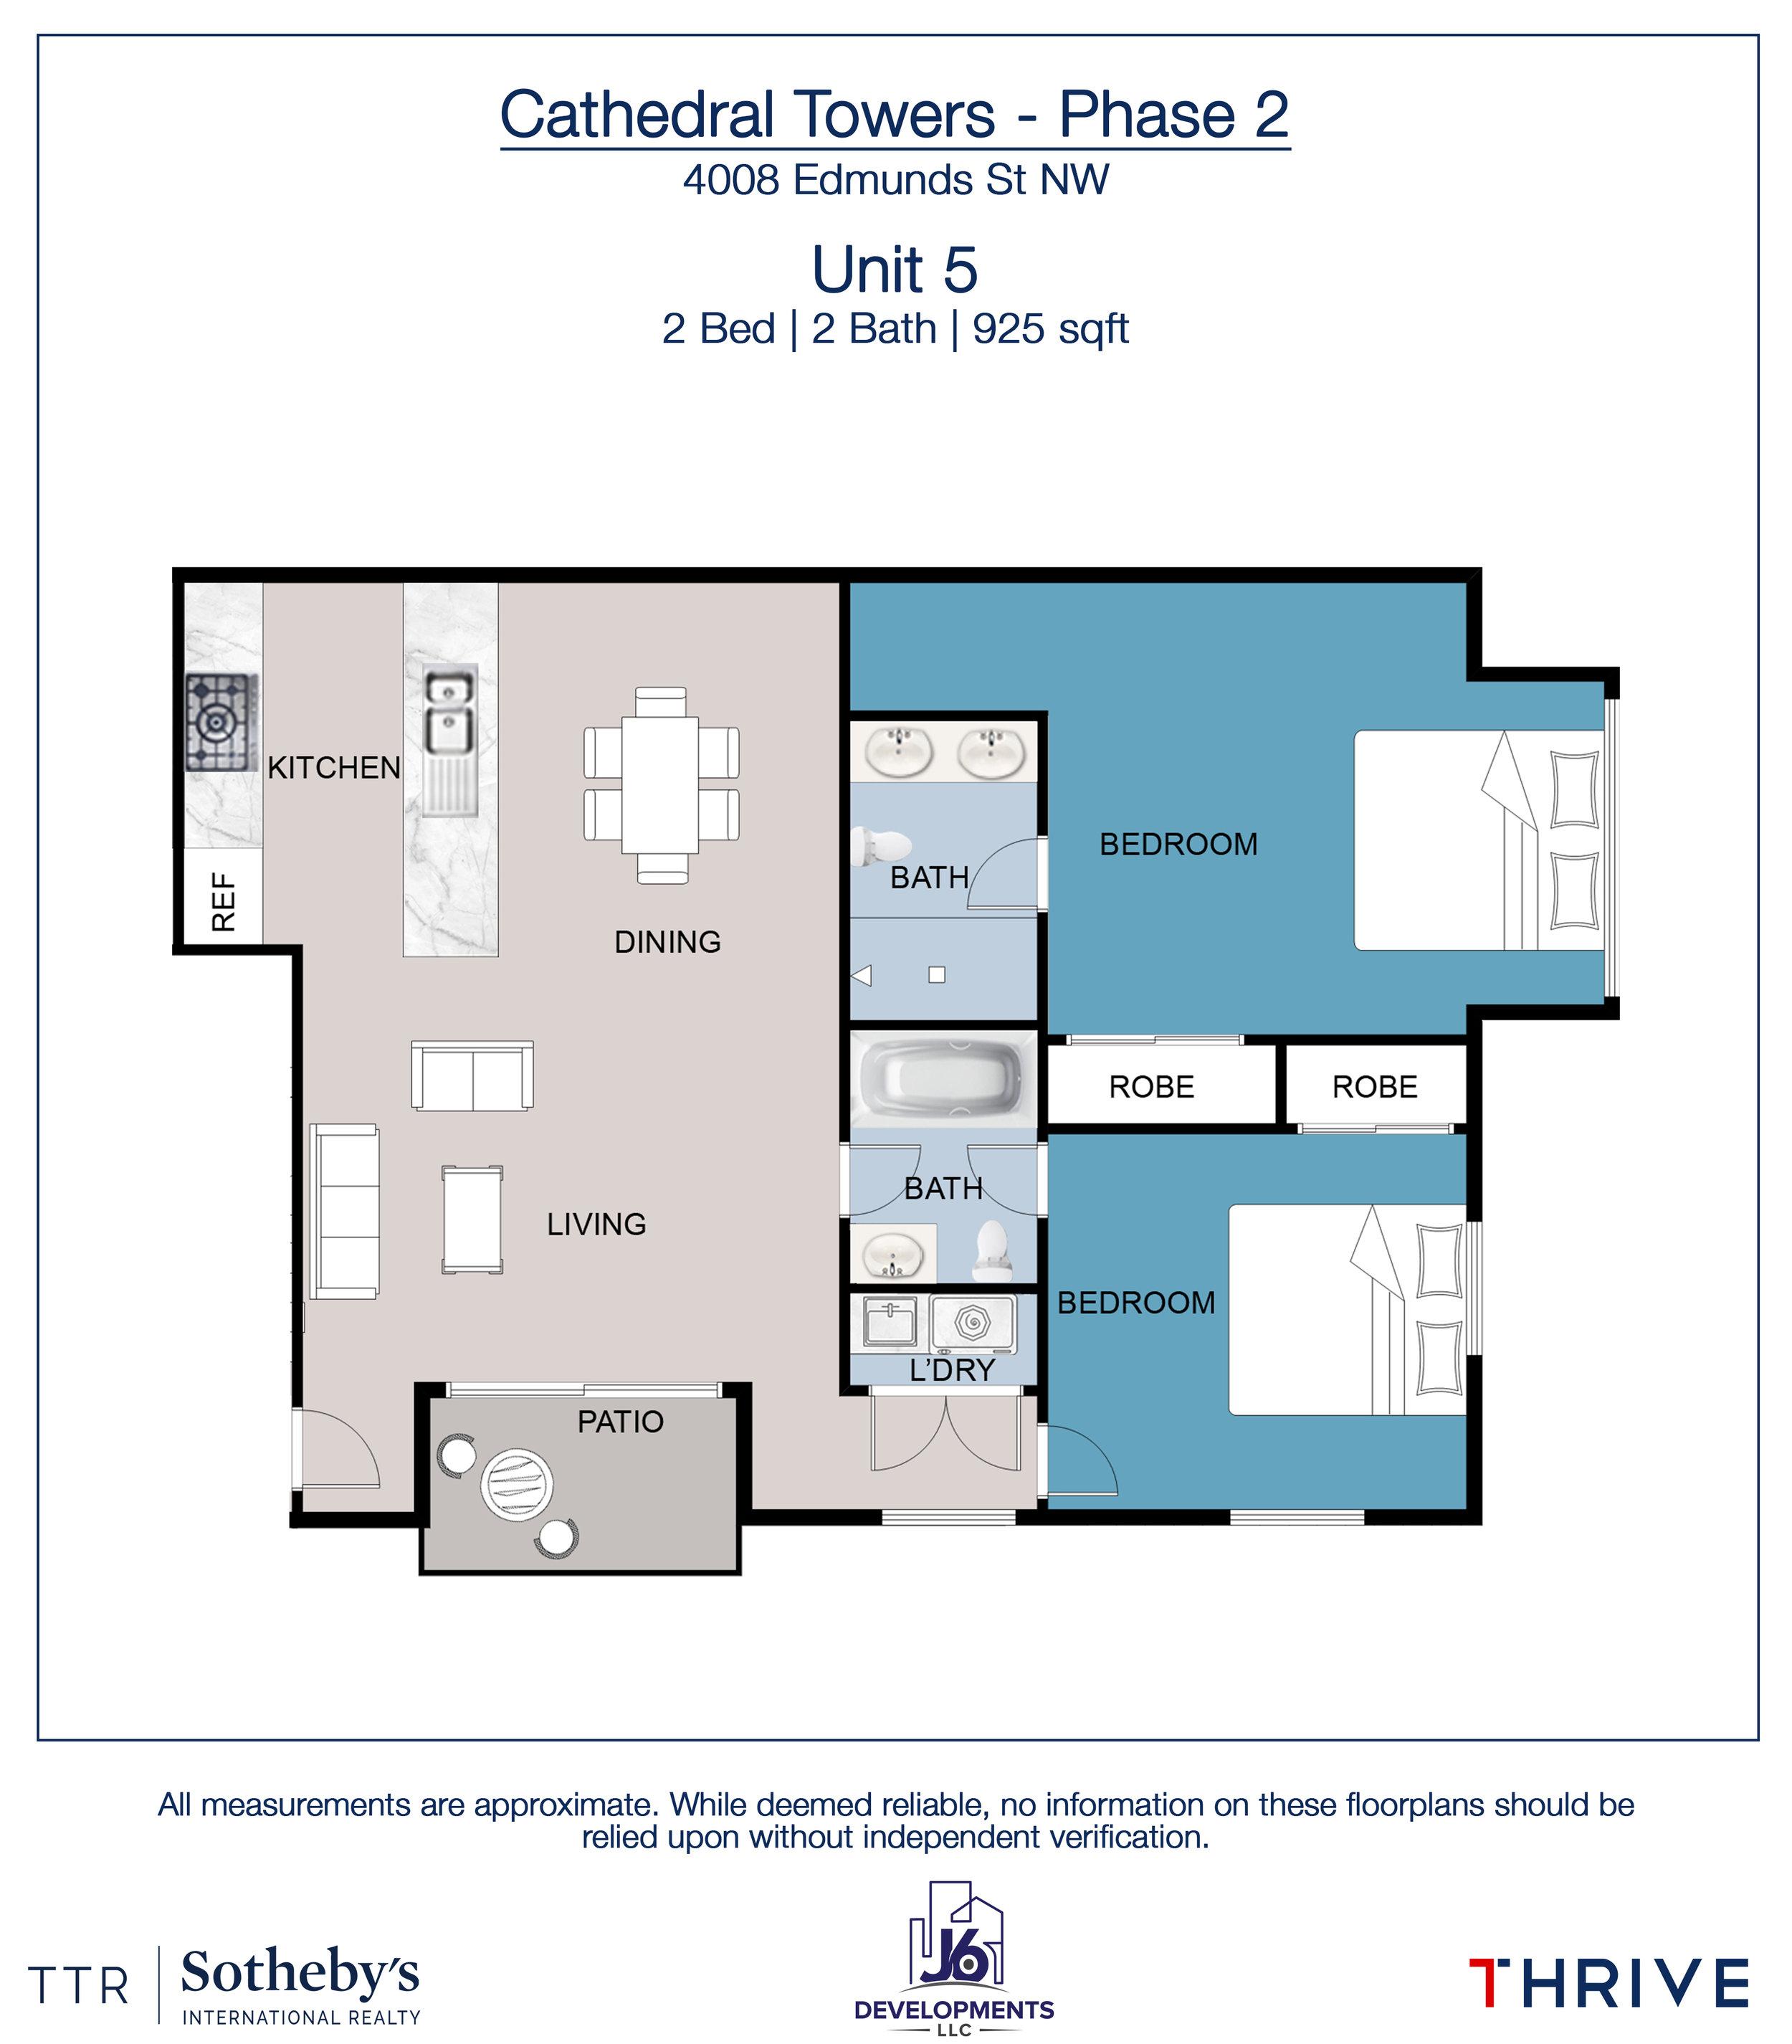 4008 Edmunds Unit 5 - Floorplan - 7.31.18.jpg